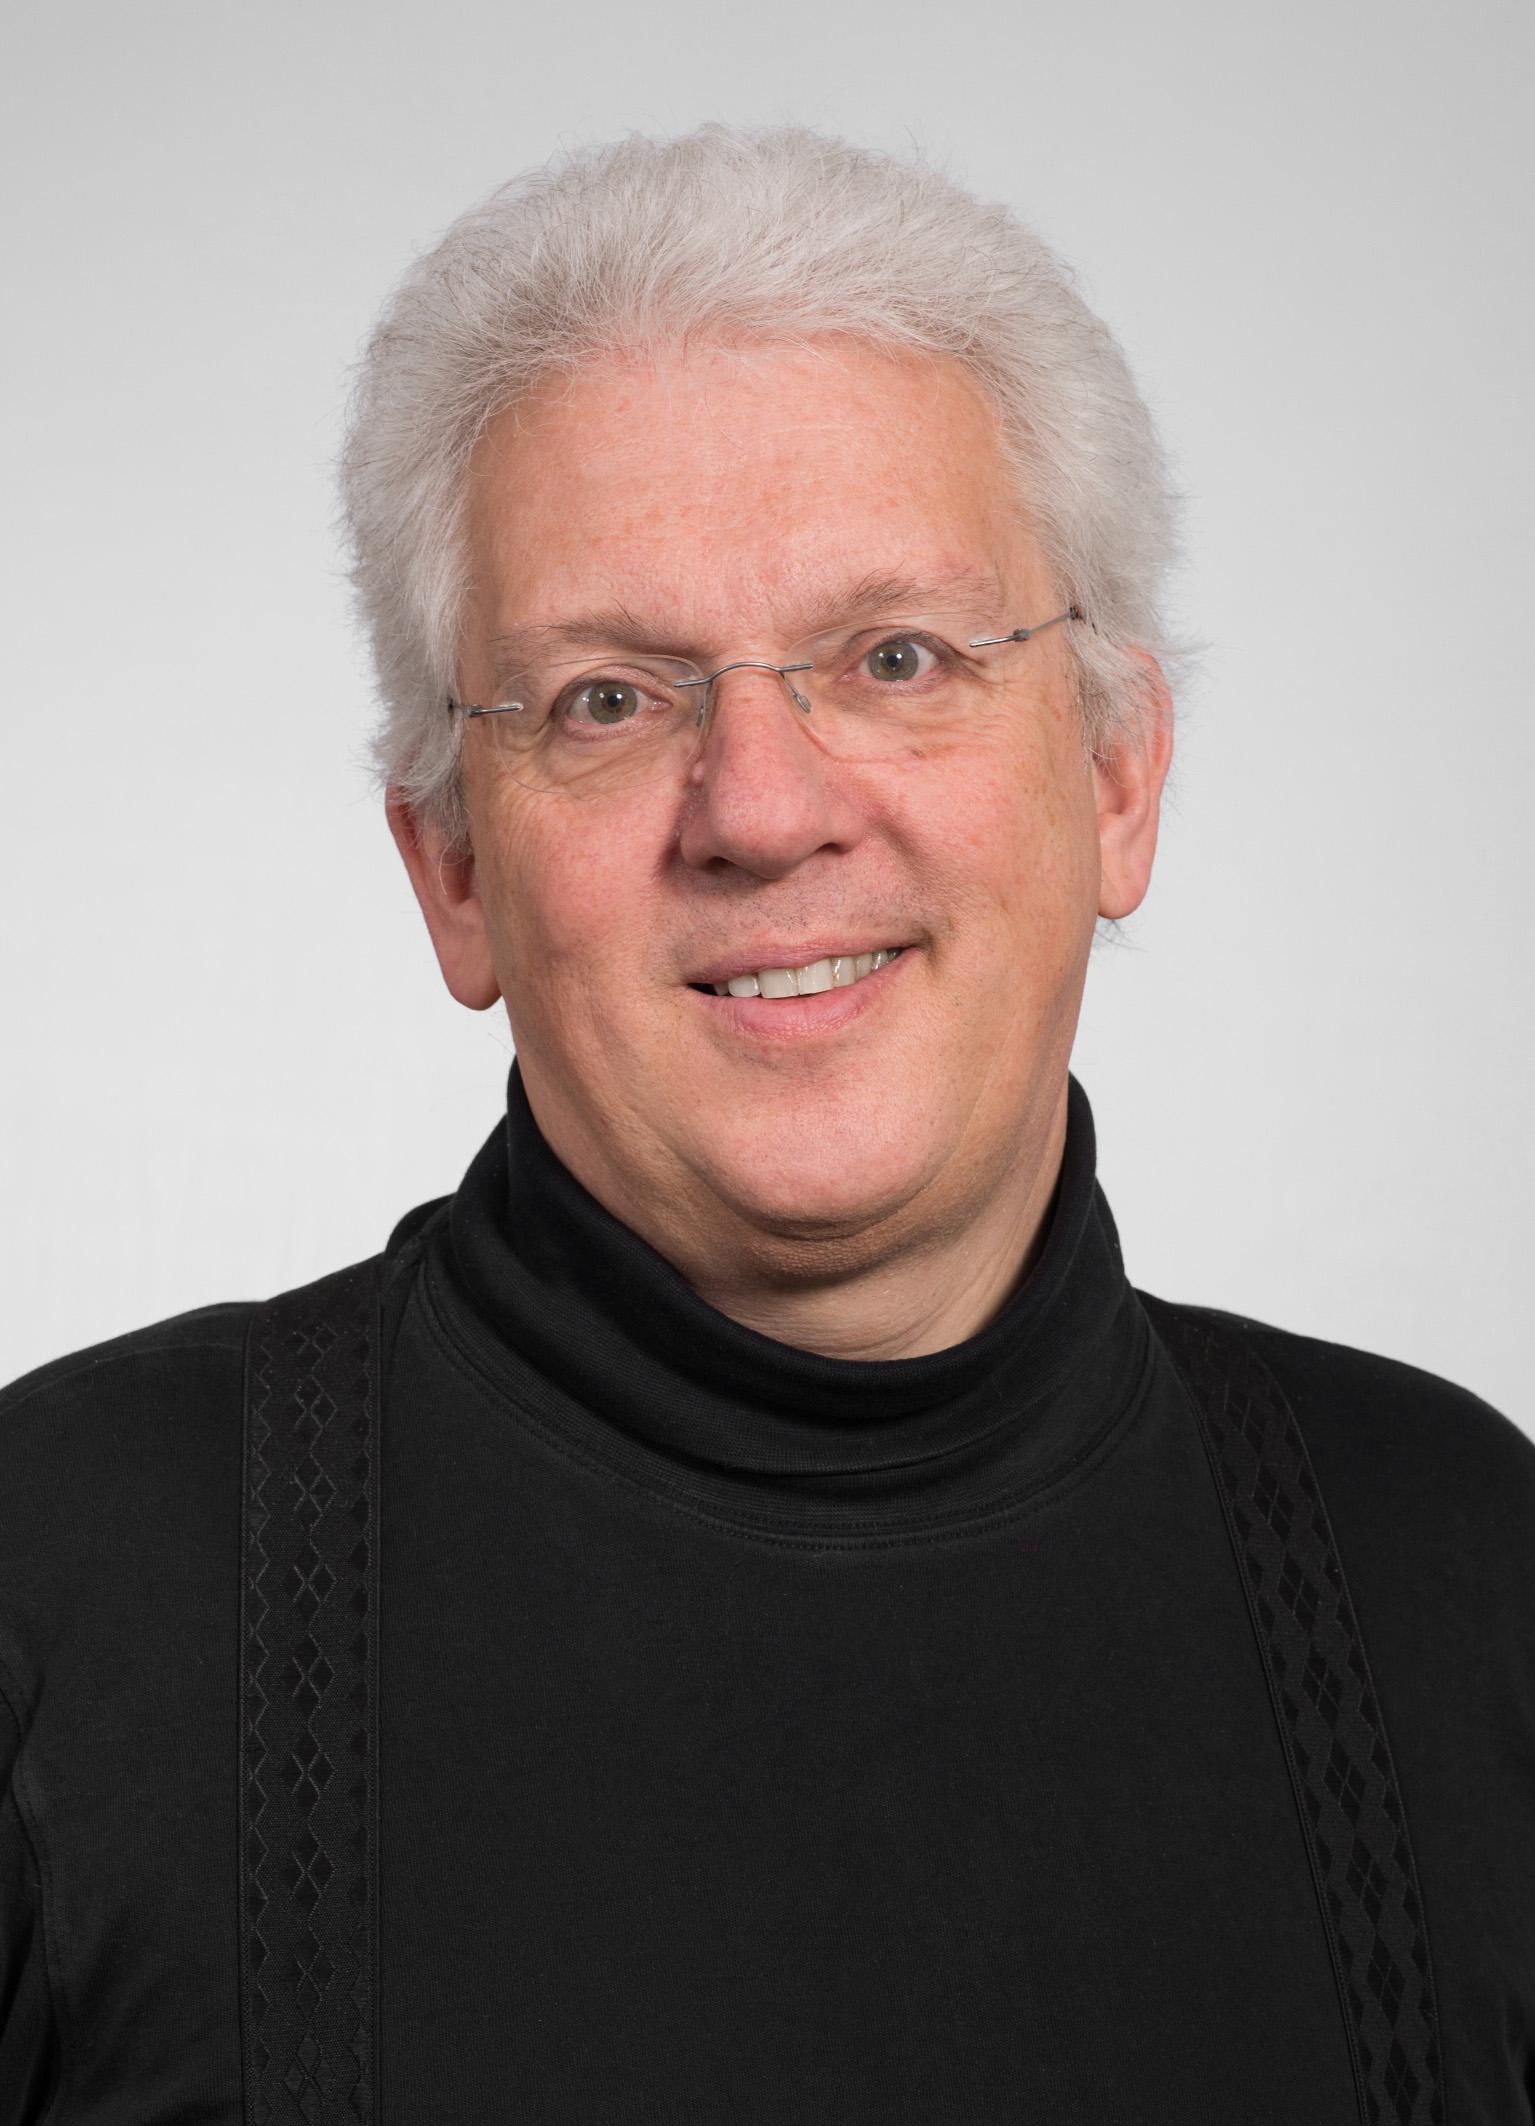 Paul Tavolato Profilbild